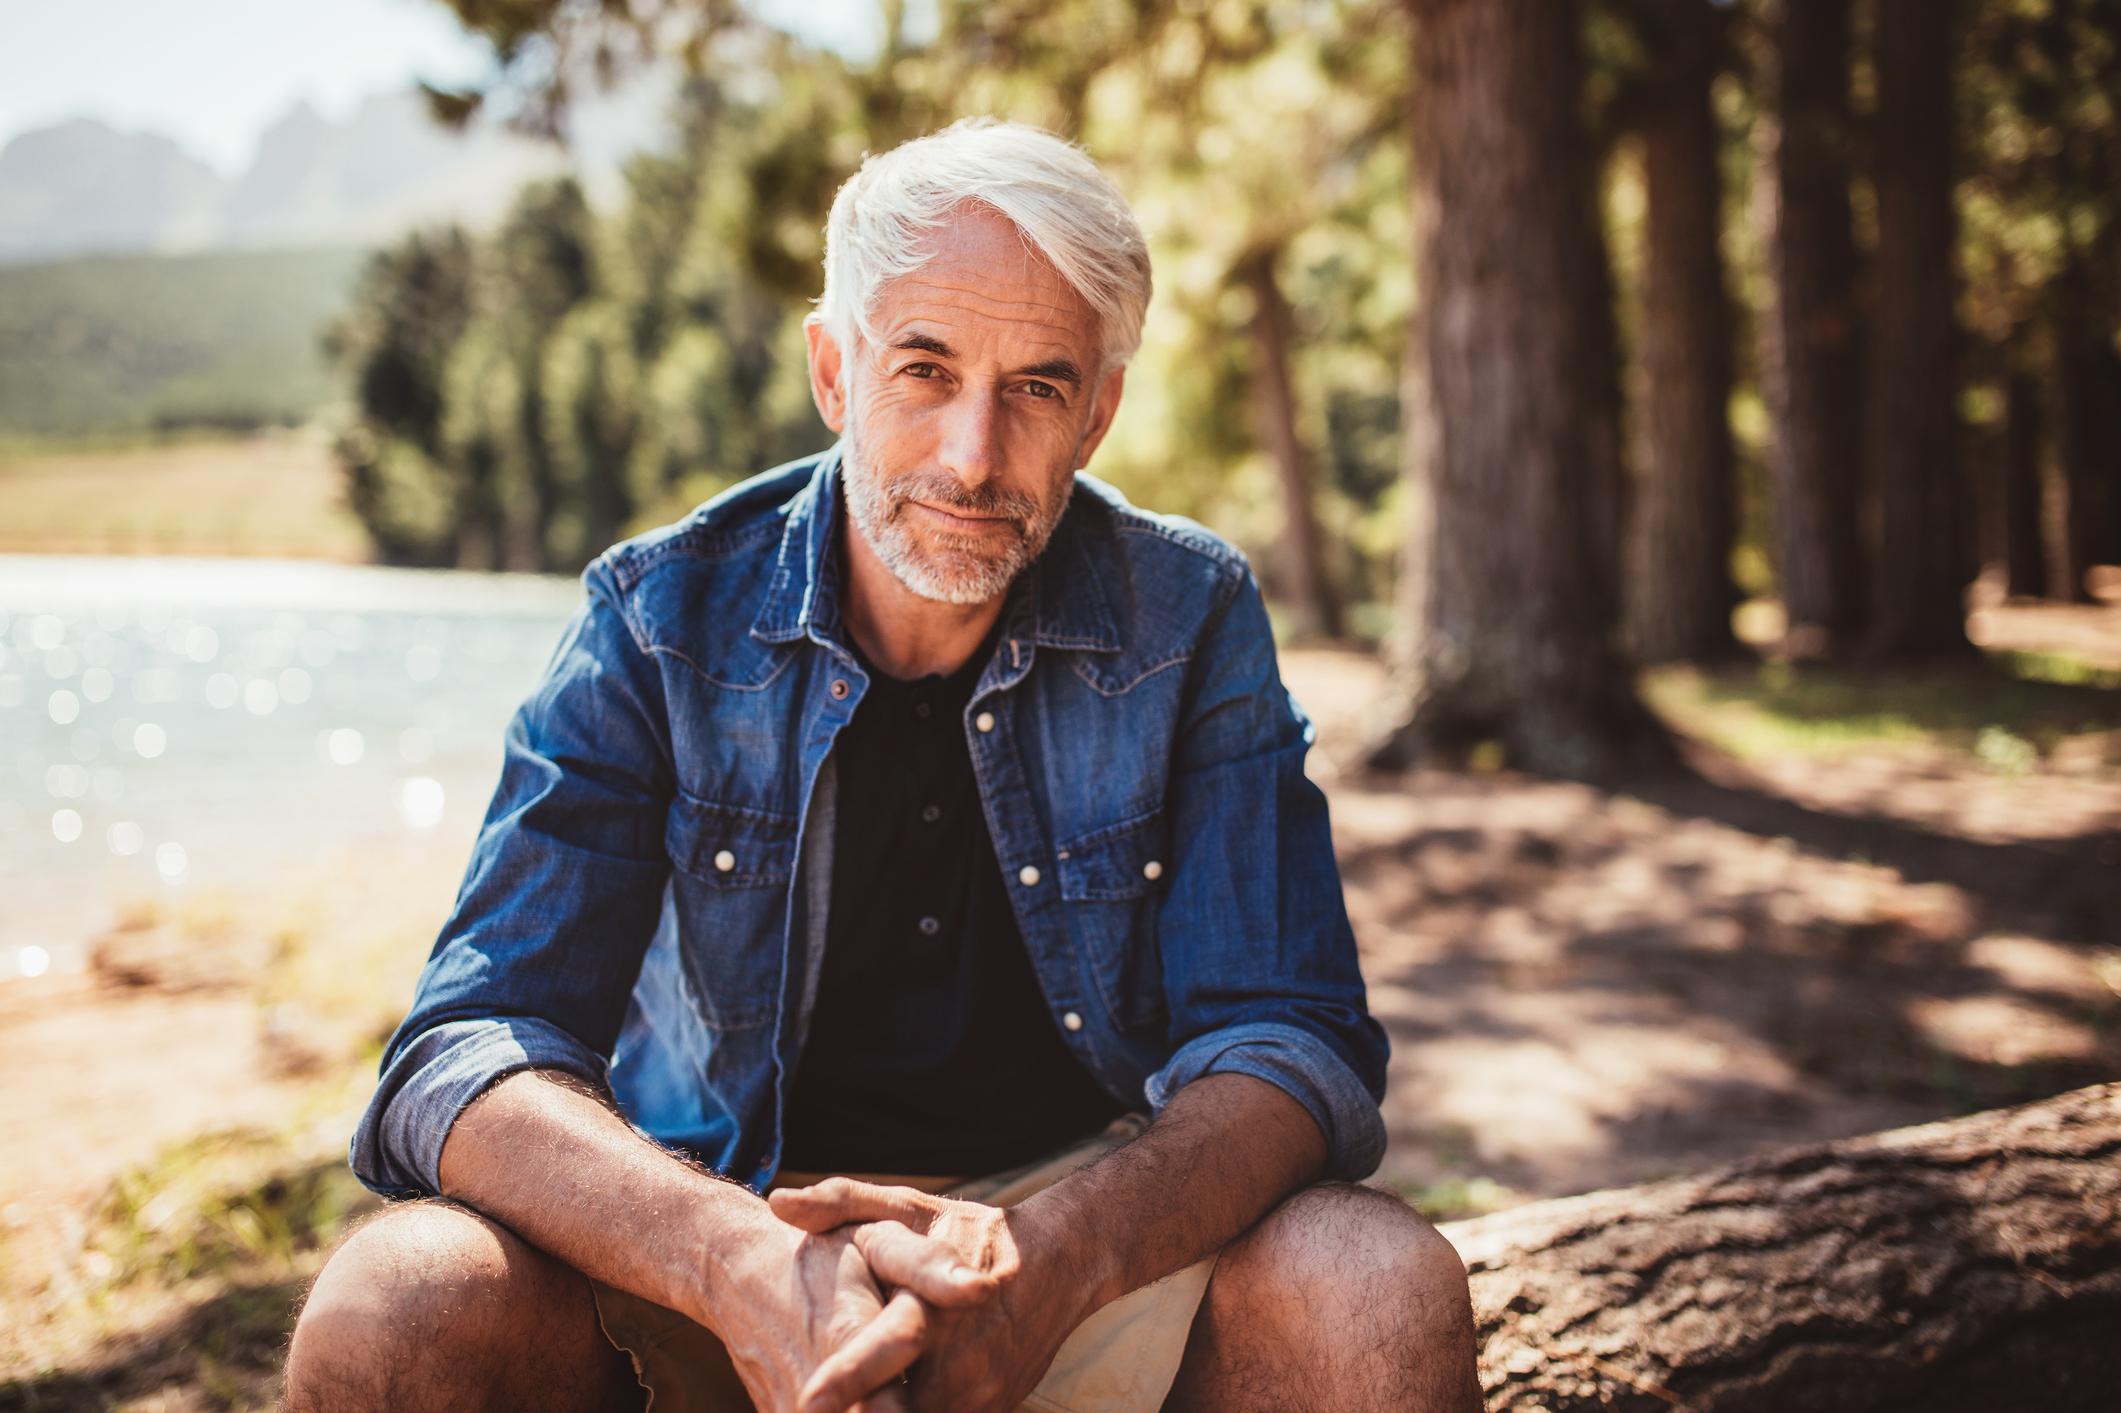 Older man sitting outdoors